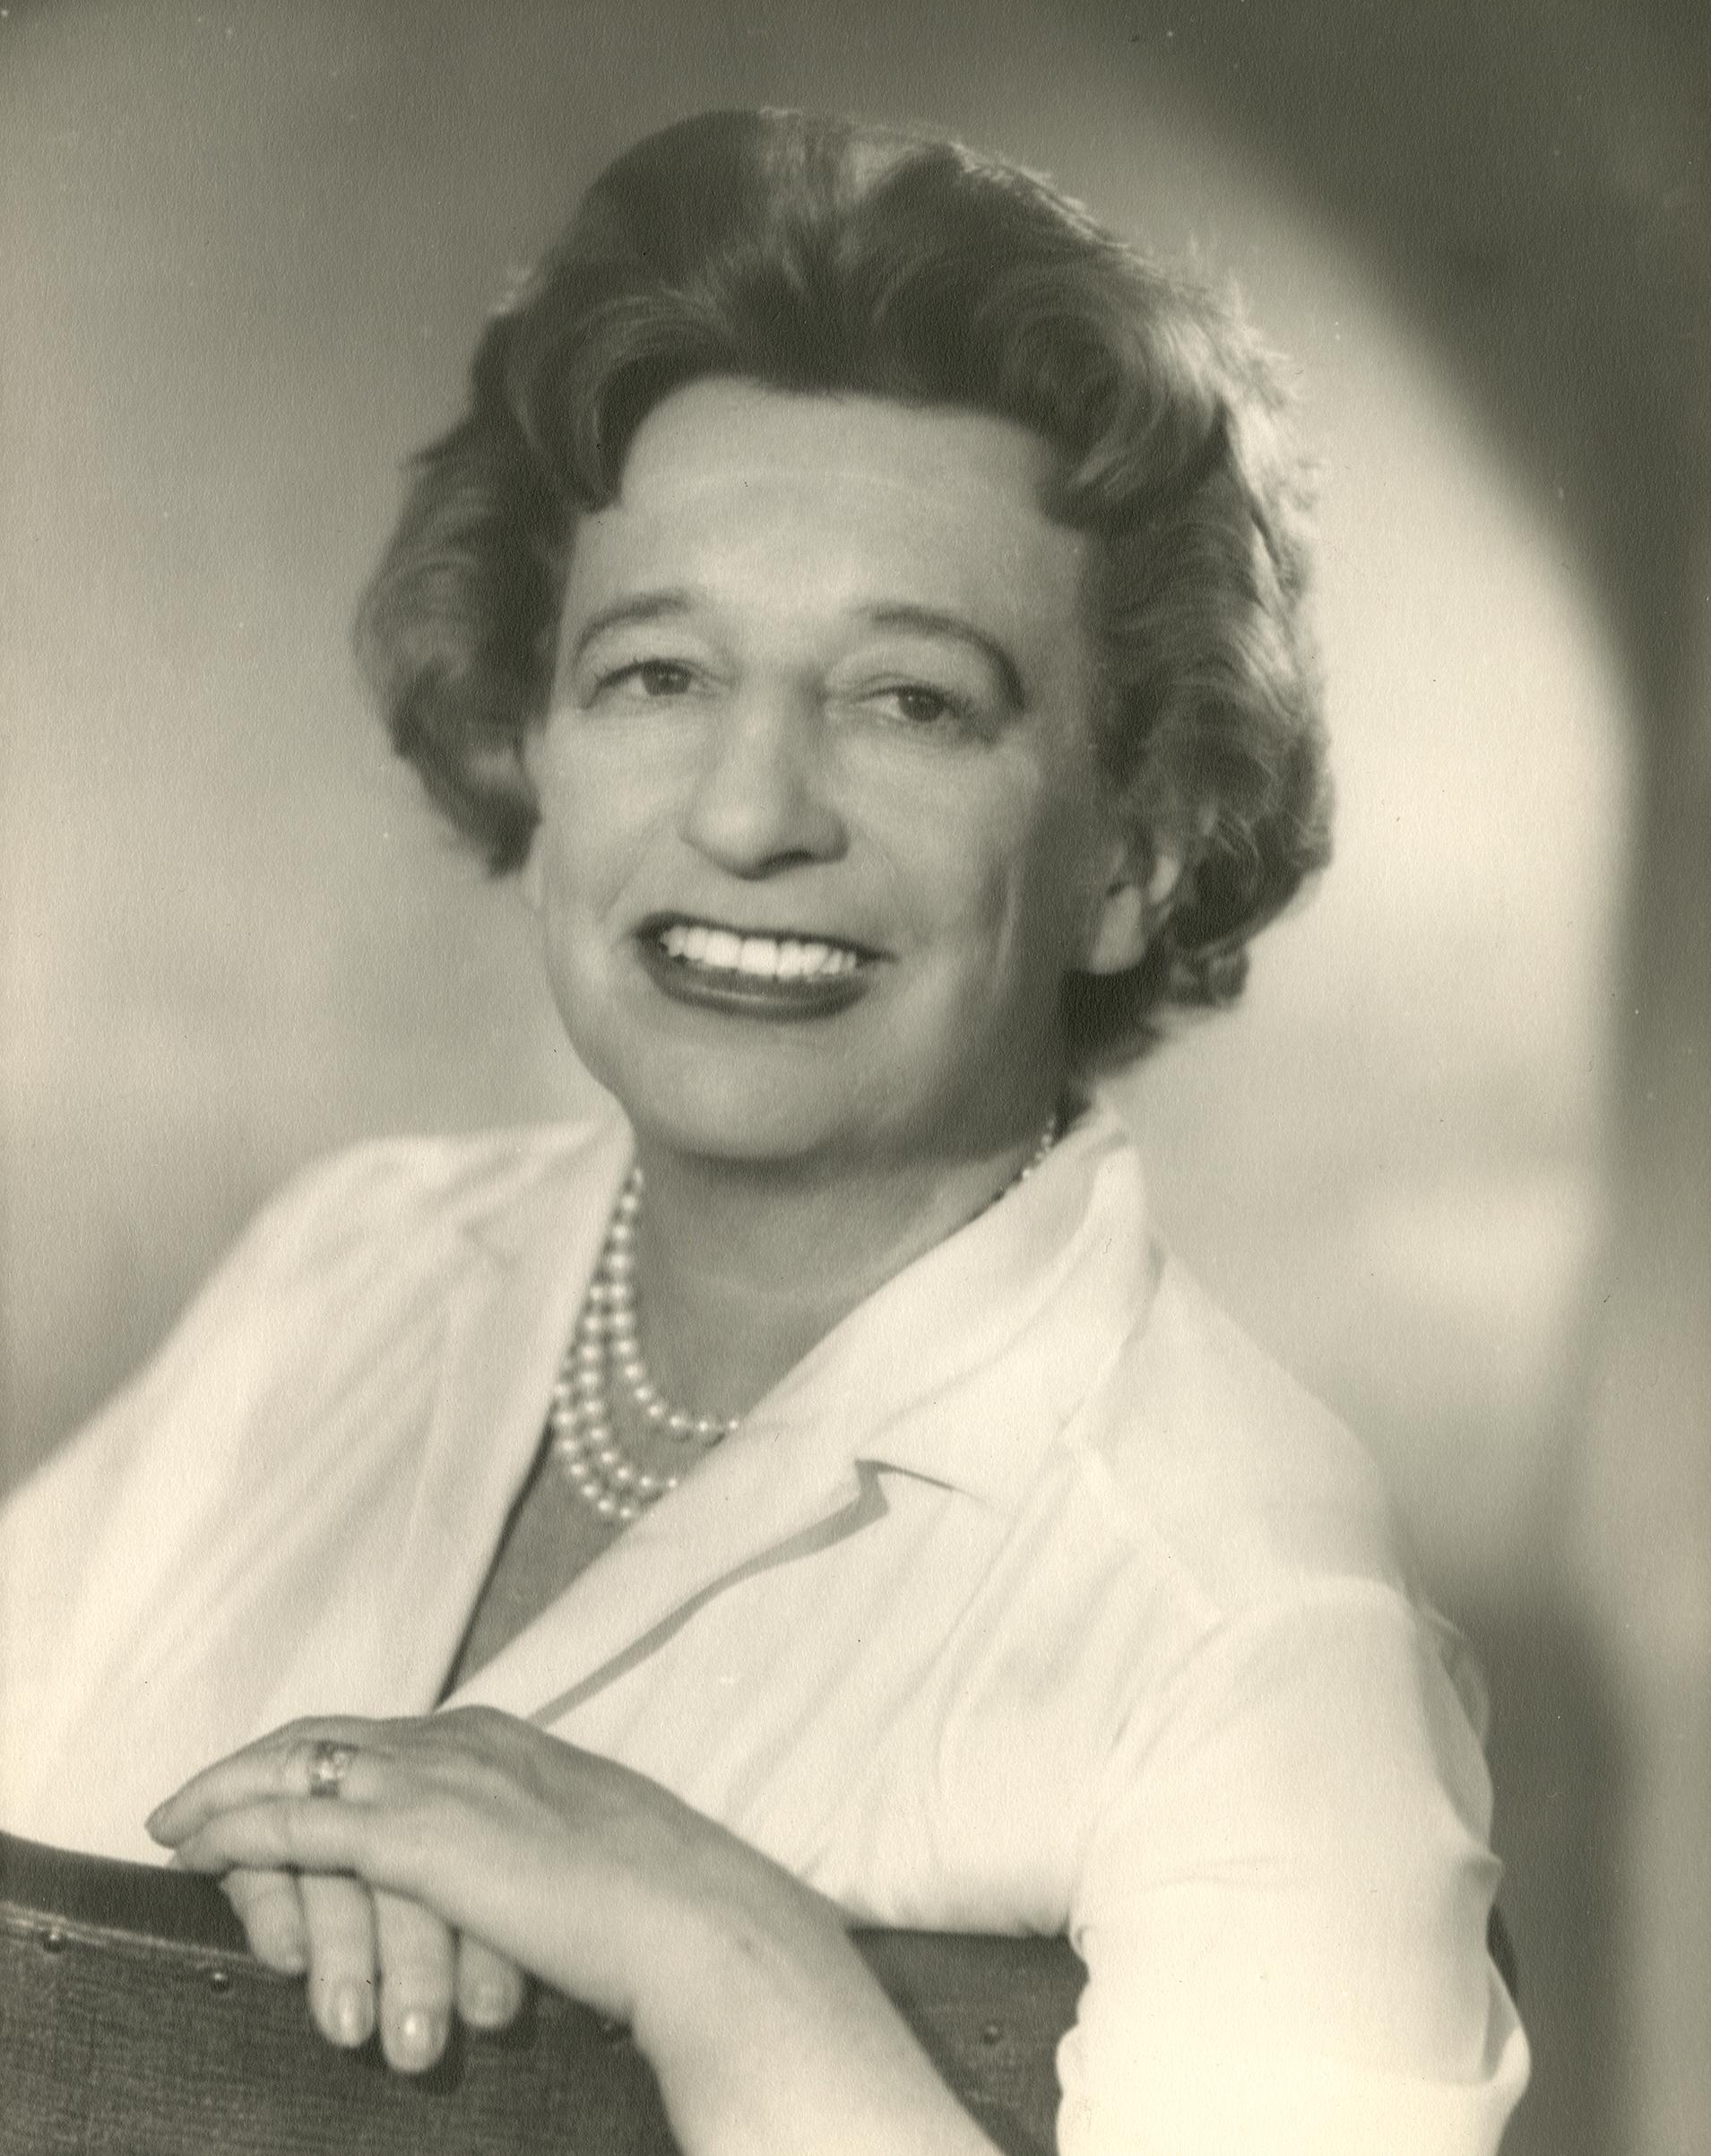 Lillian Hellman, 1961. Gelatin silver print. New-York Historical Society, Gift of Kenneth Sherman.